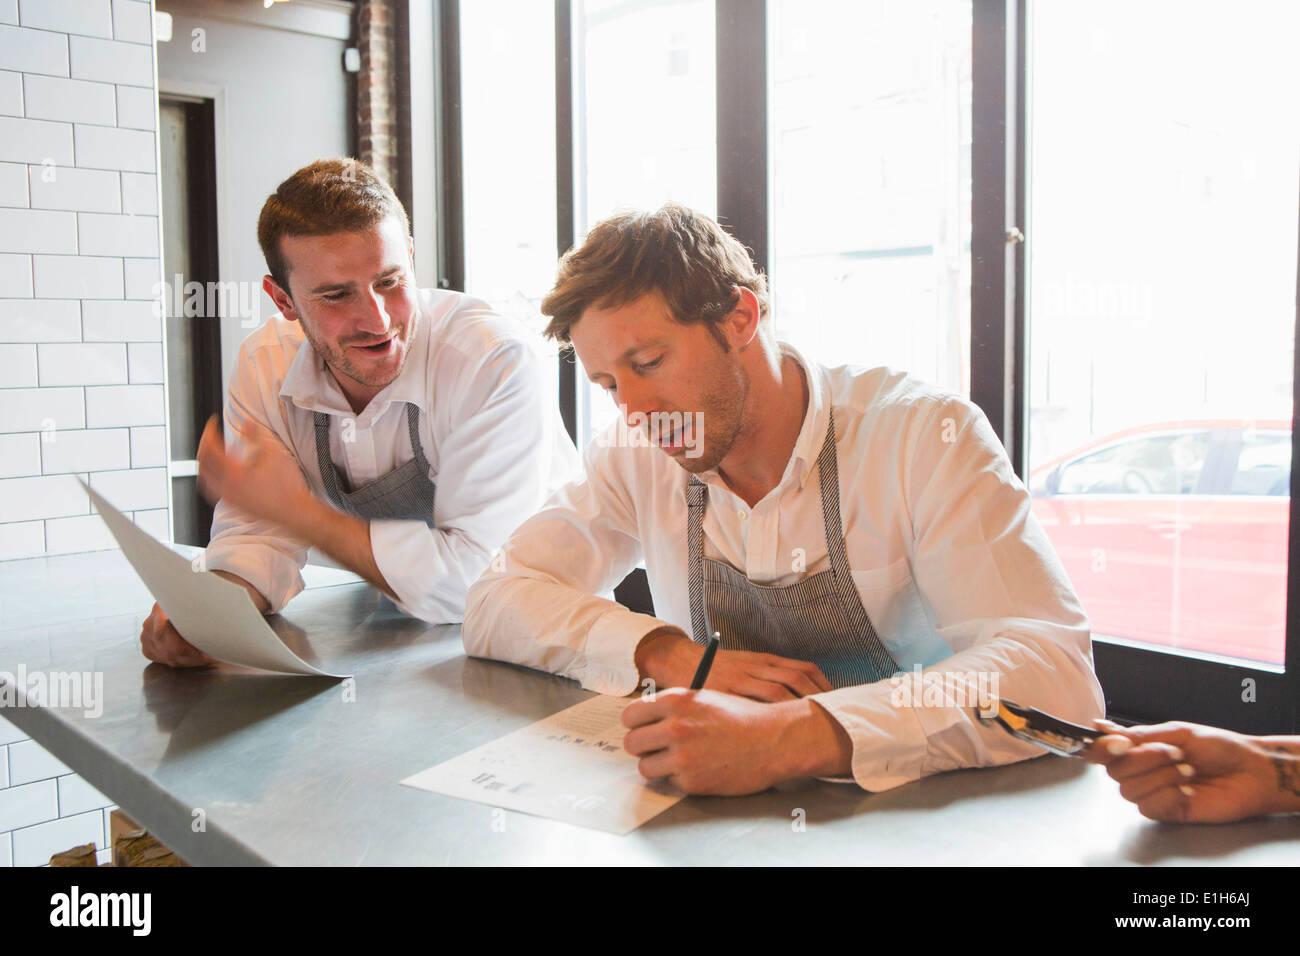 Chefs preparing for service in restaurant - Stock Image